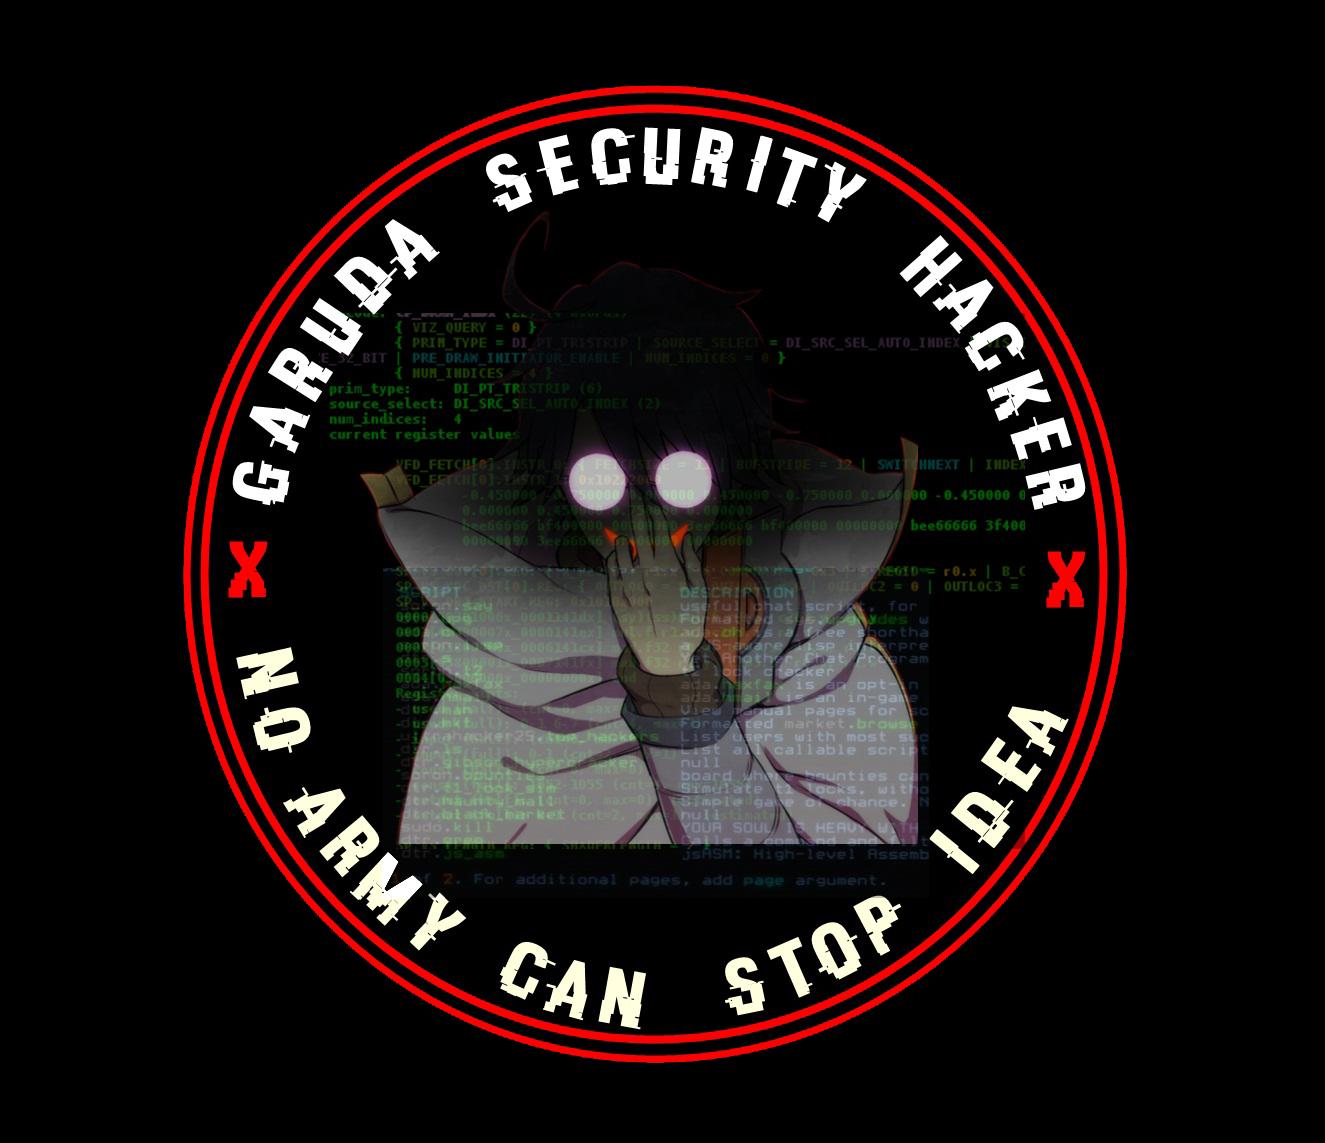 PHP] asdsadsadas - Pastebin com